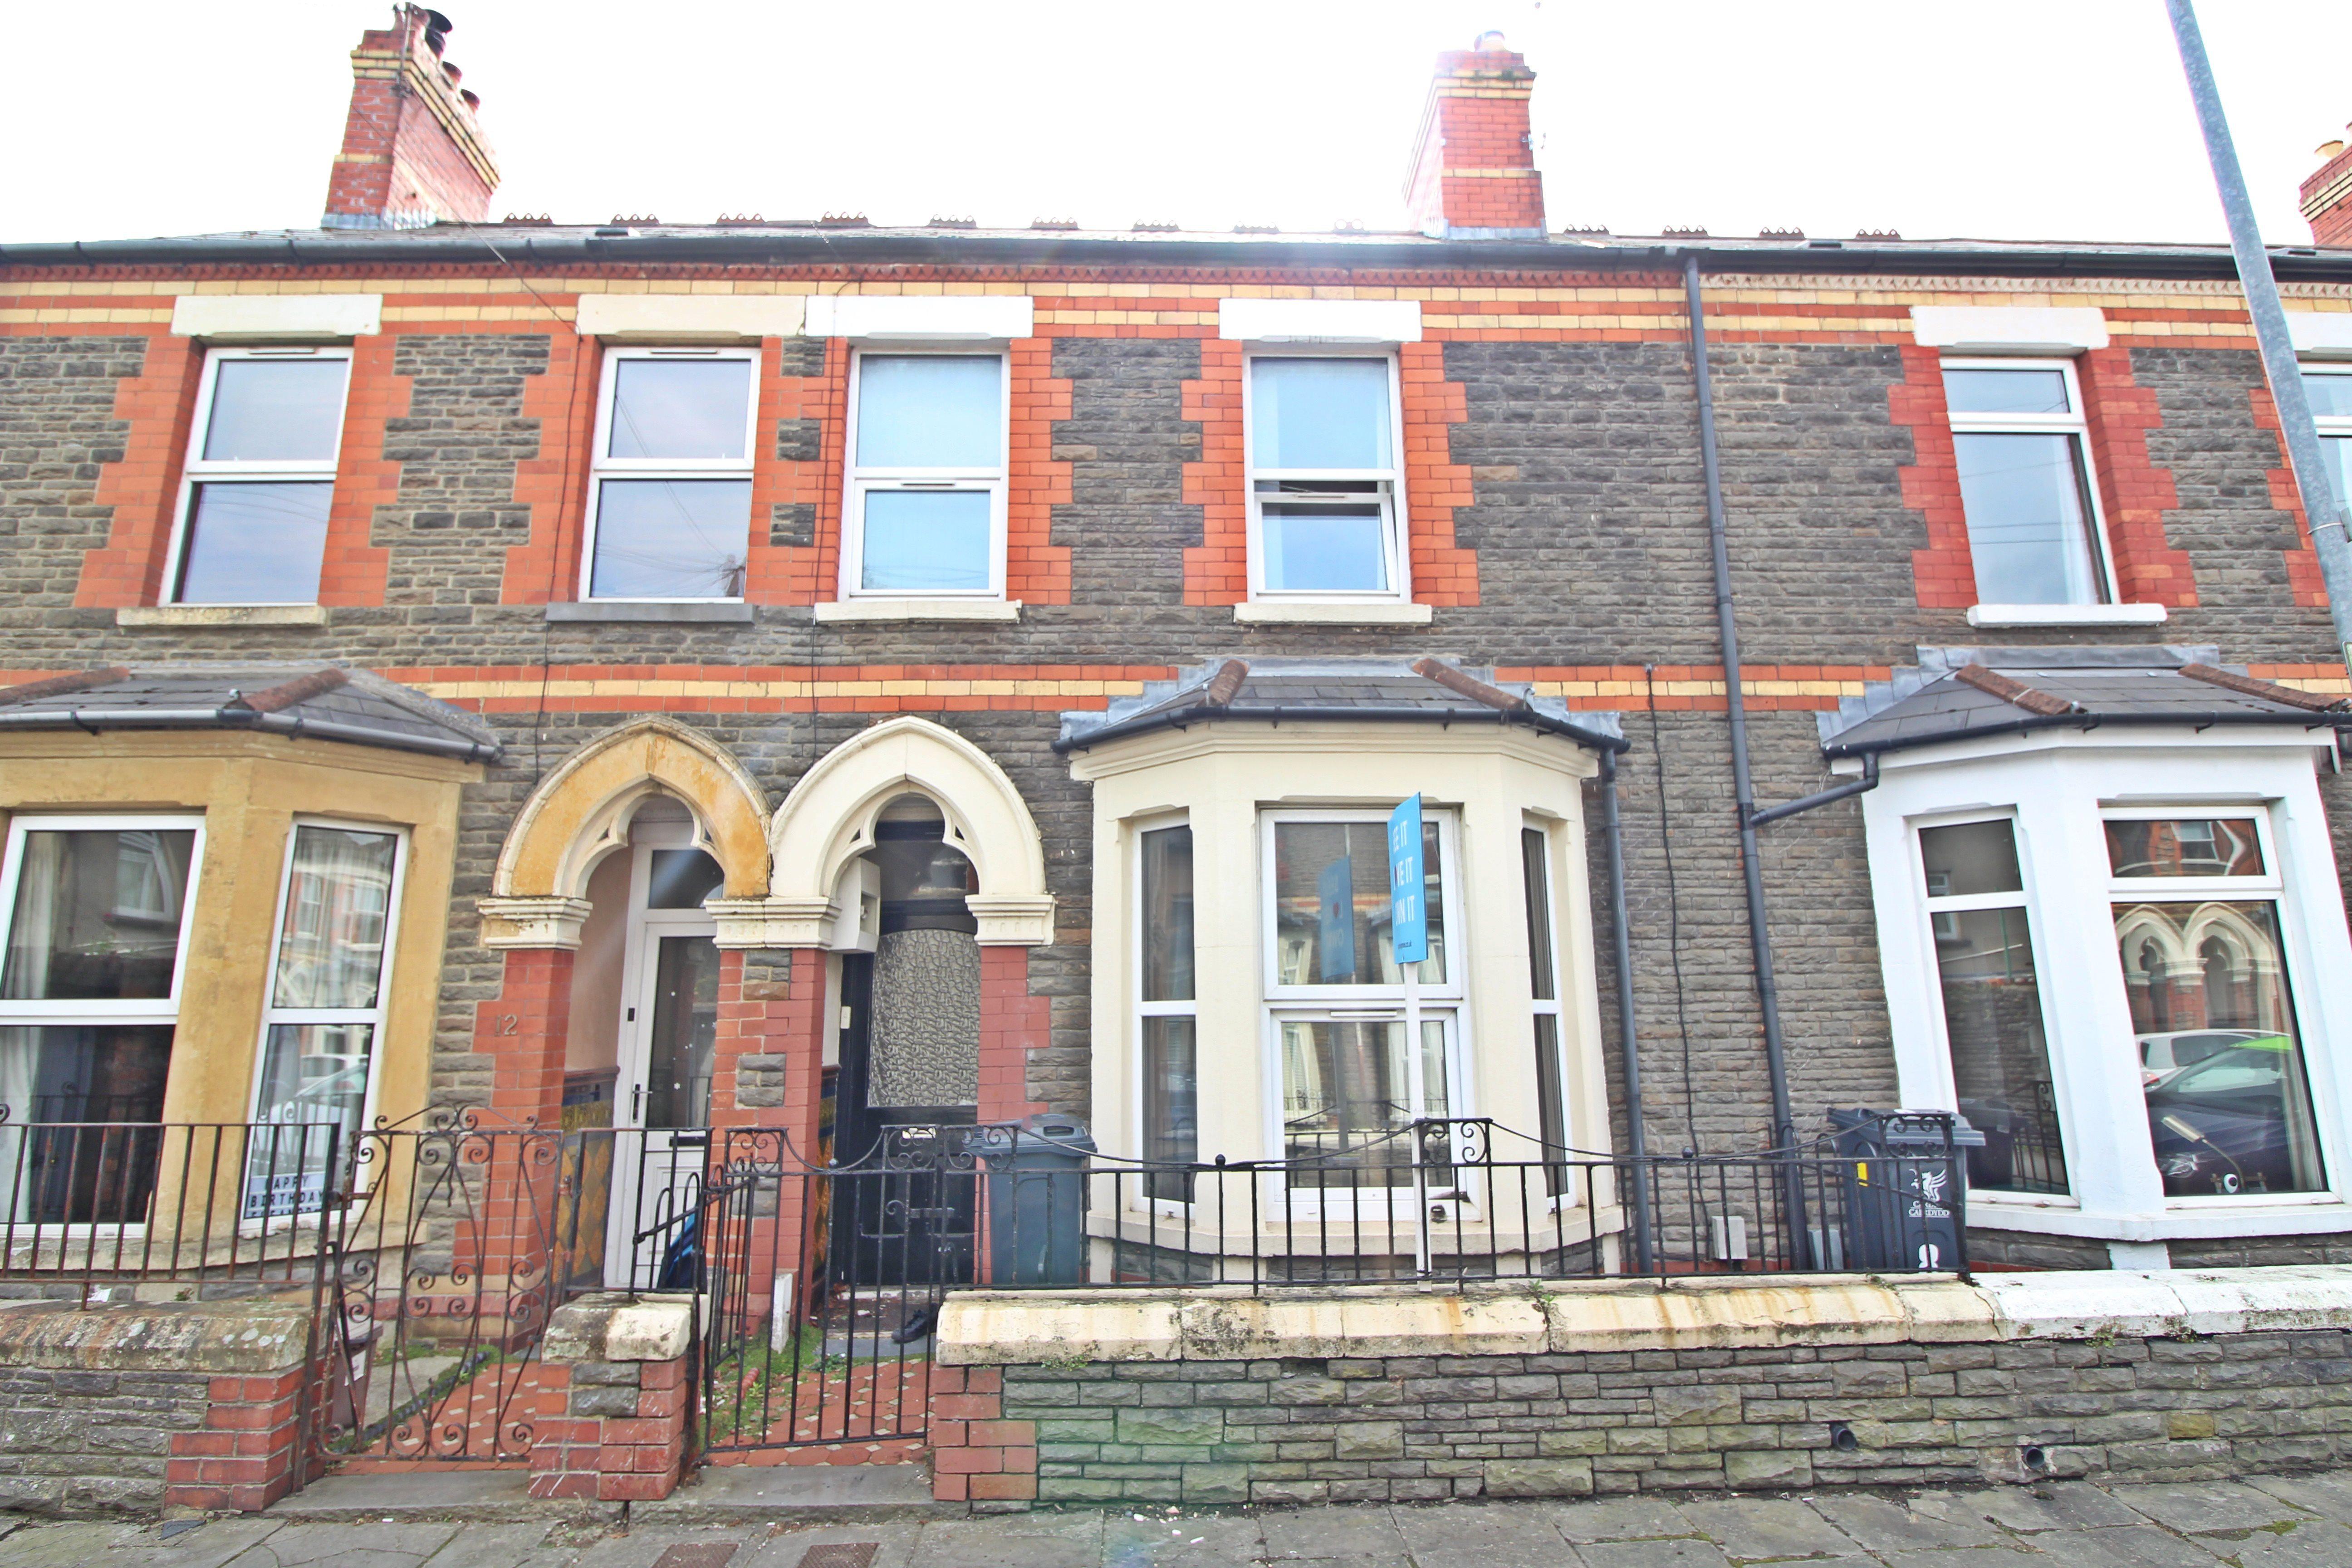 Tulloch Street, Roath, Cardiff